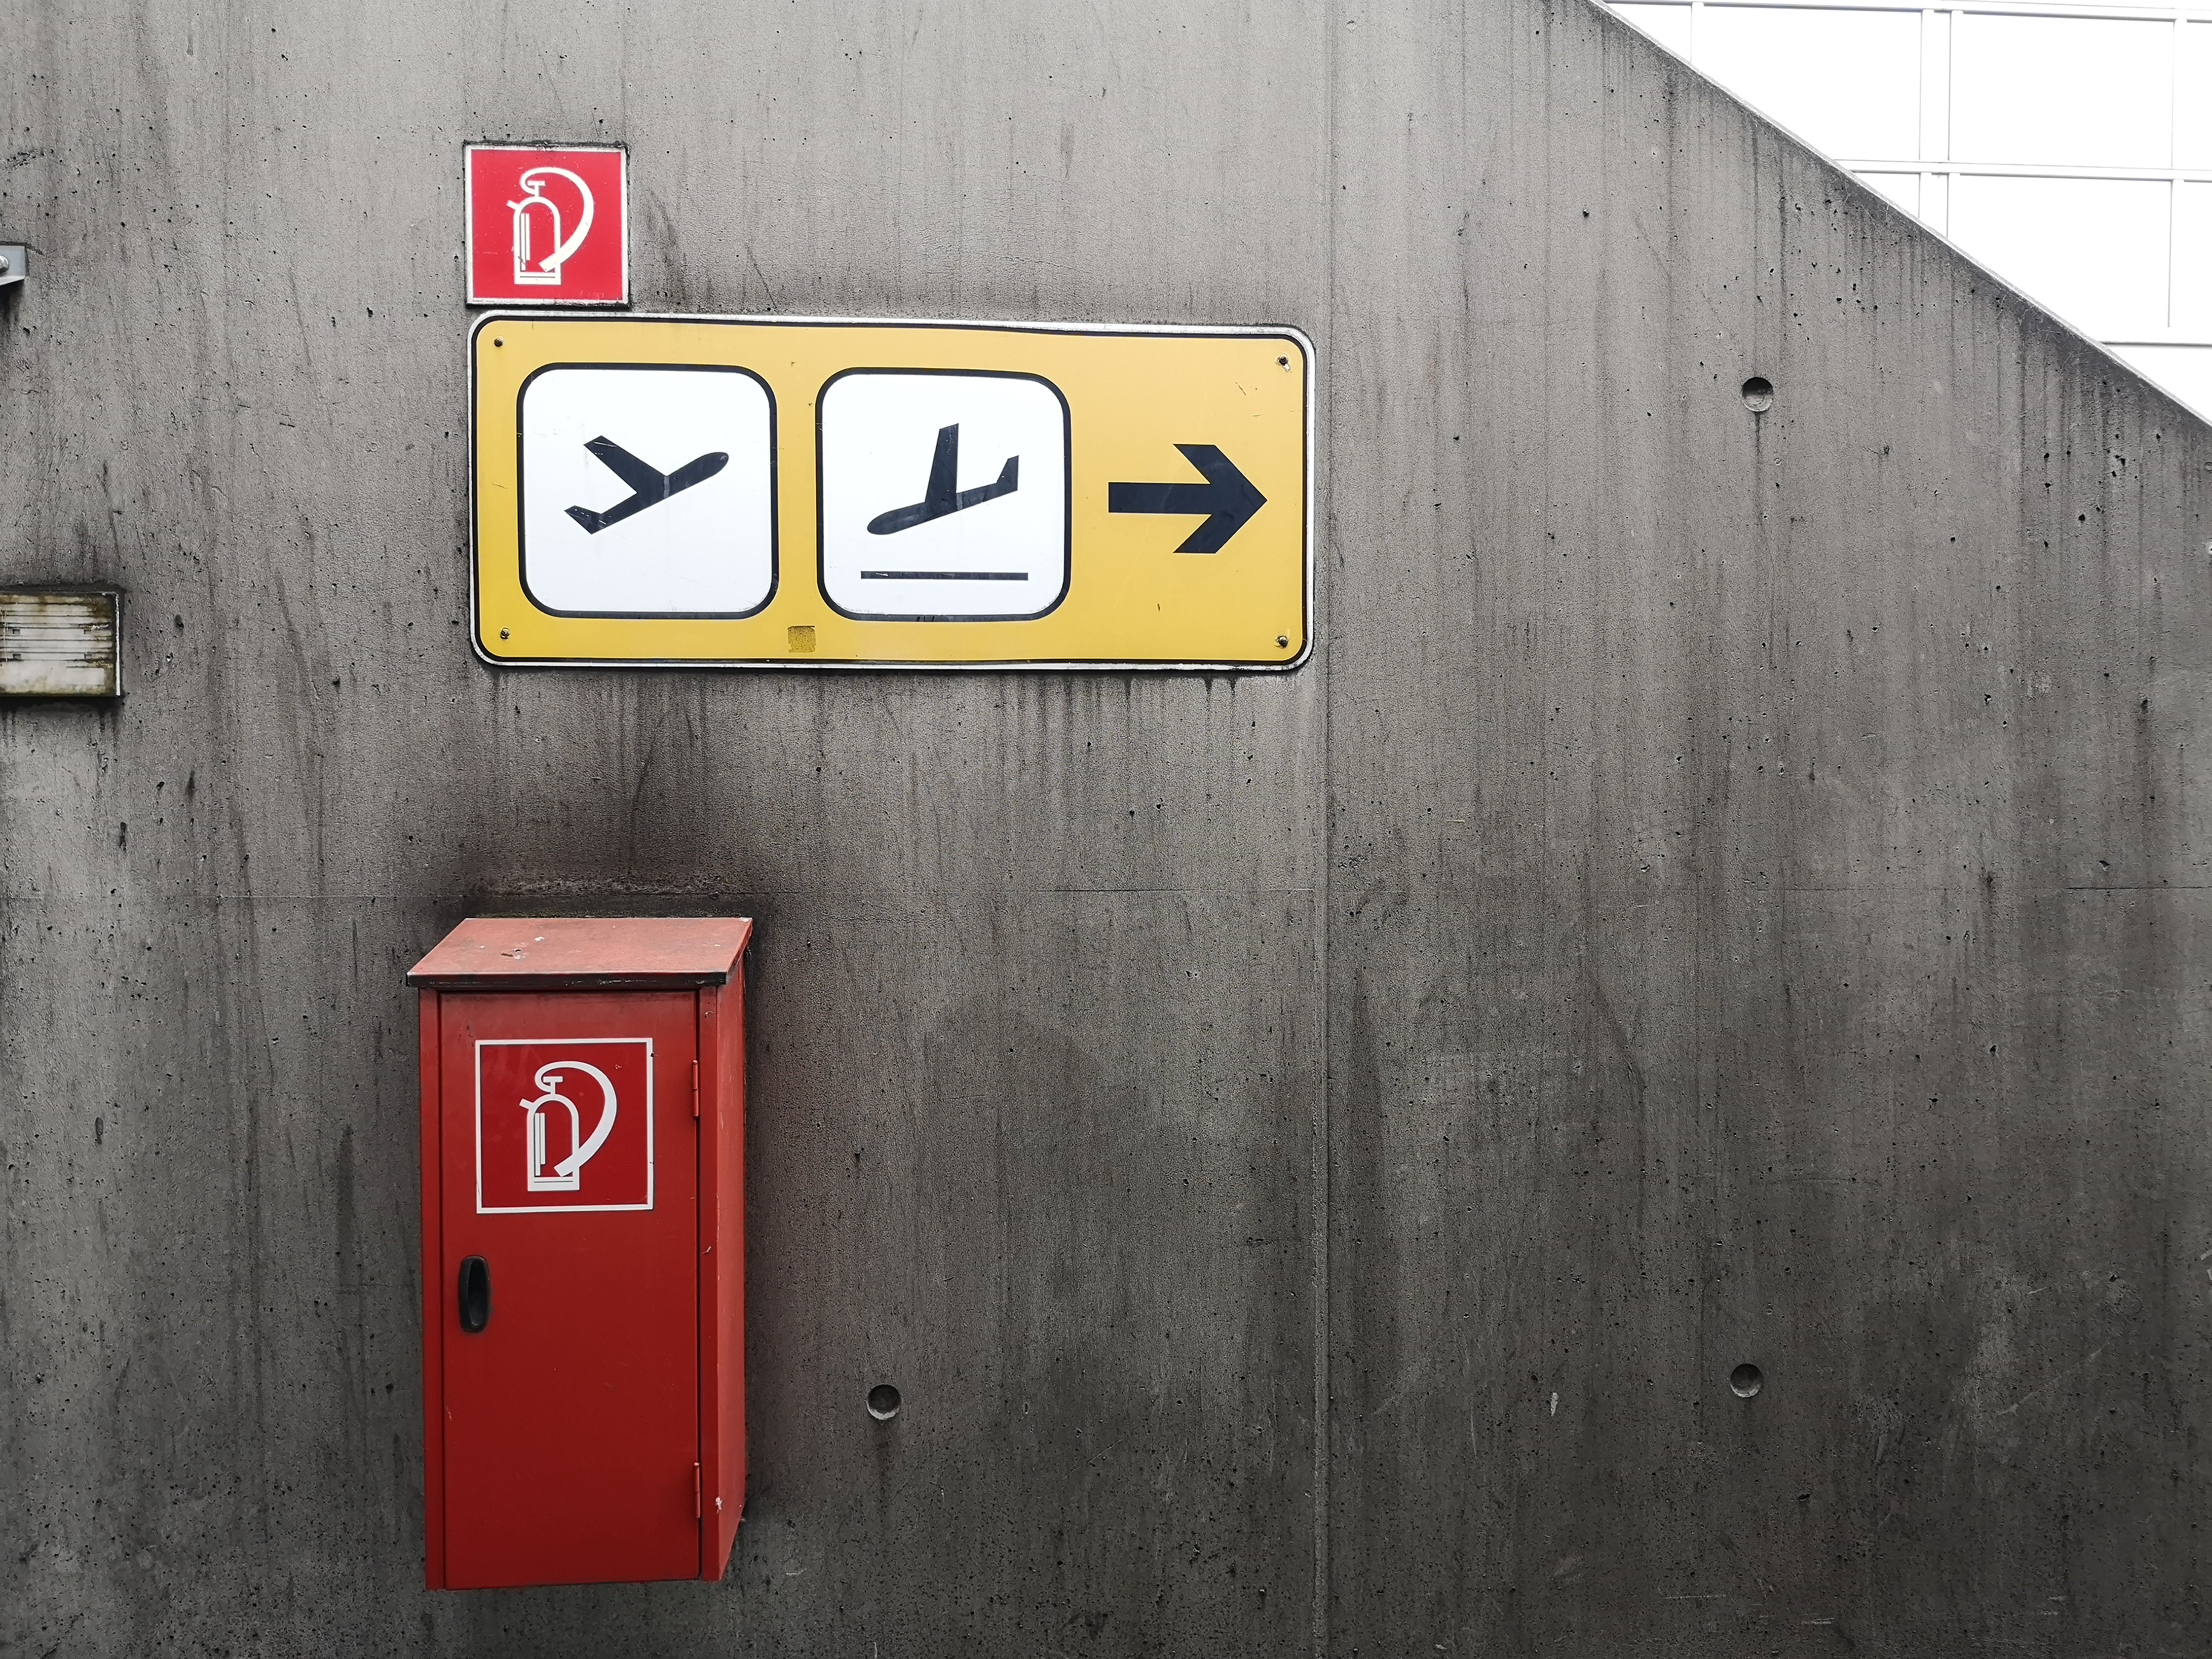 Flughafen-Tegel-Berlin Abflug Ankunft